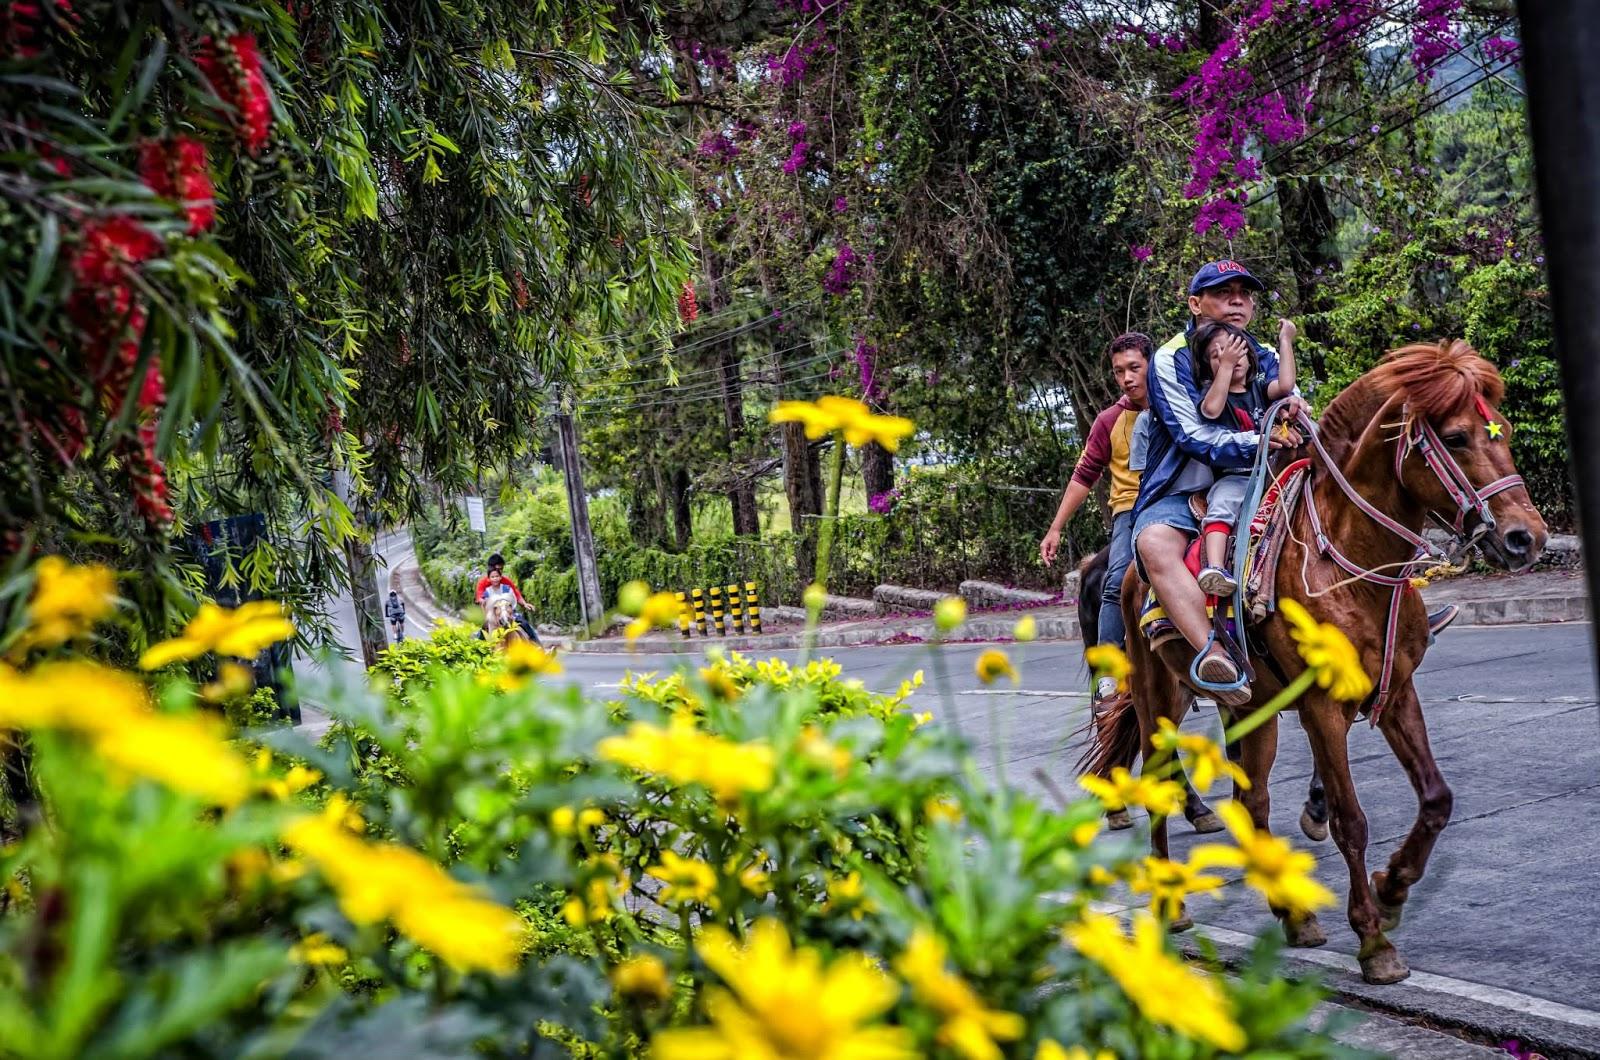 Baguio City Wright Horseback Riding Livelihood